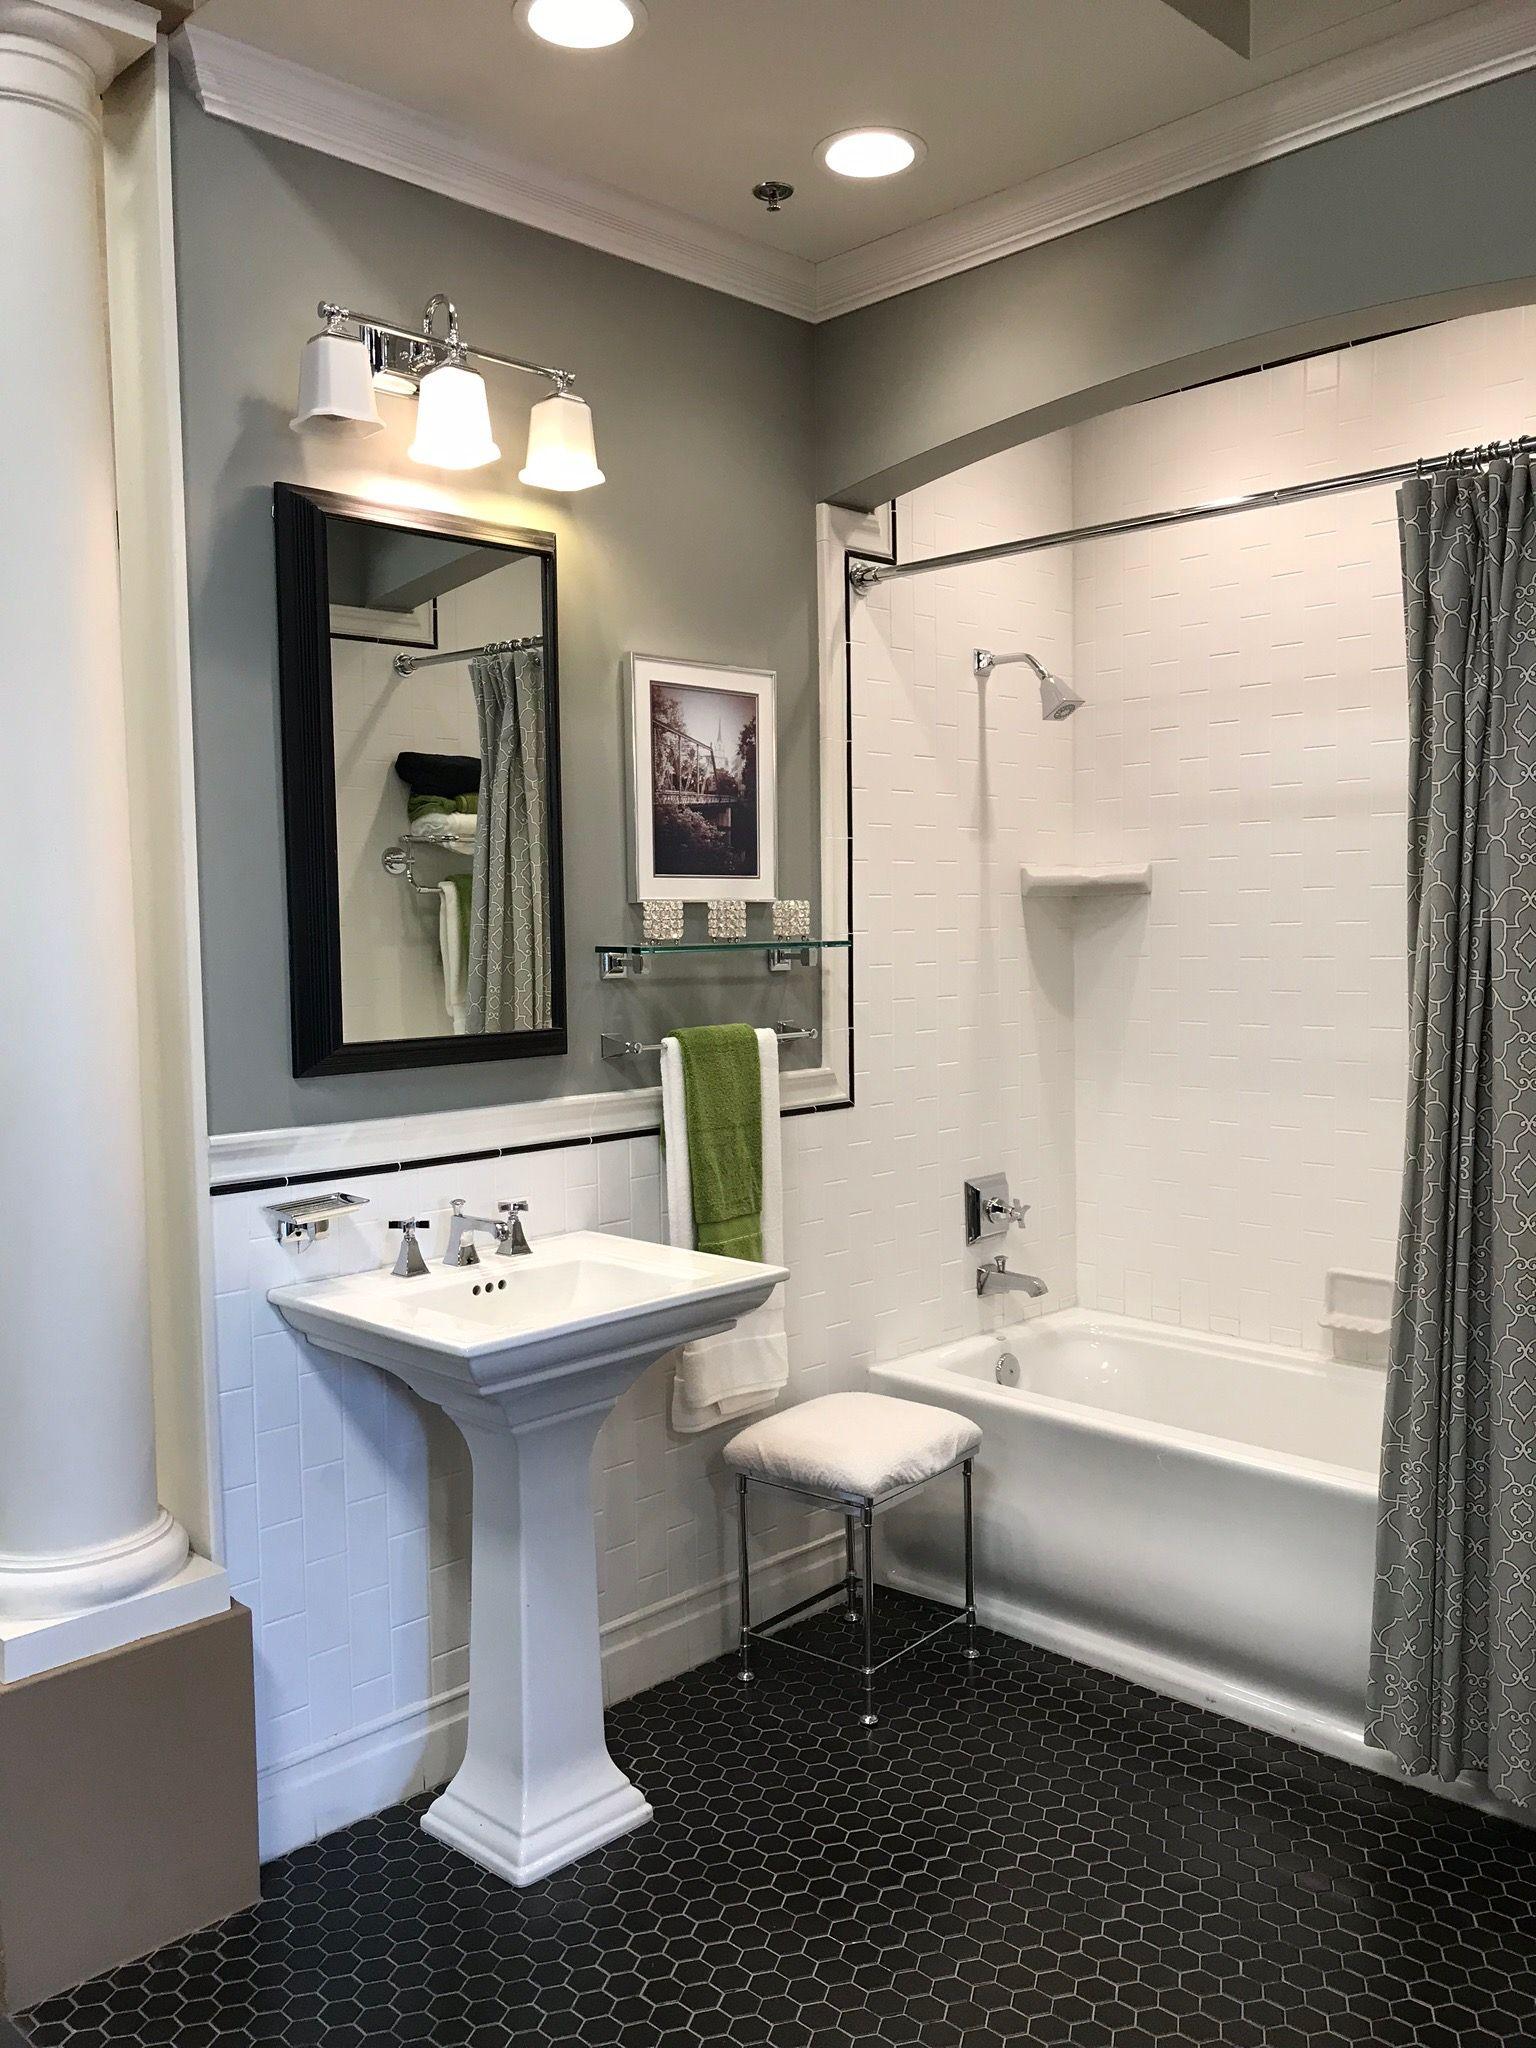 Pin by Susan Danilovich on Bathroom remodeling | Bathrooms ...